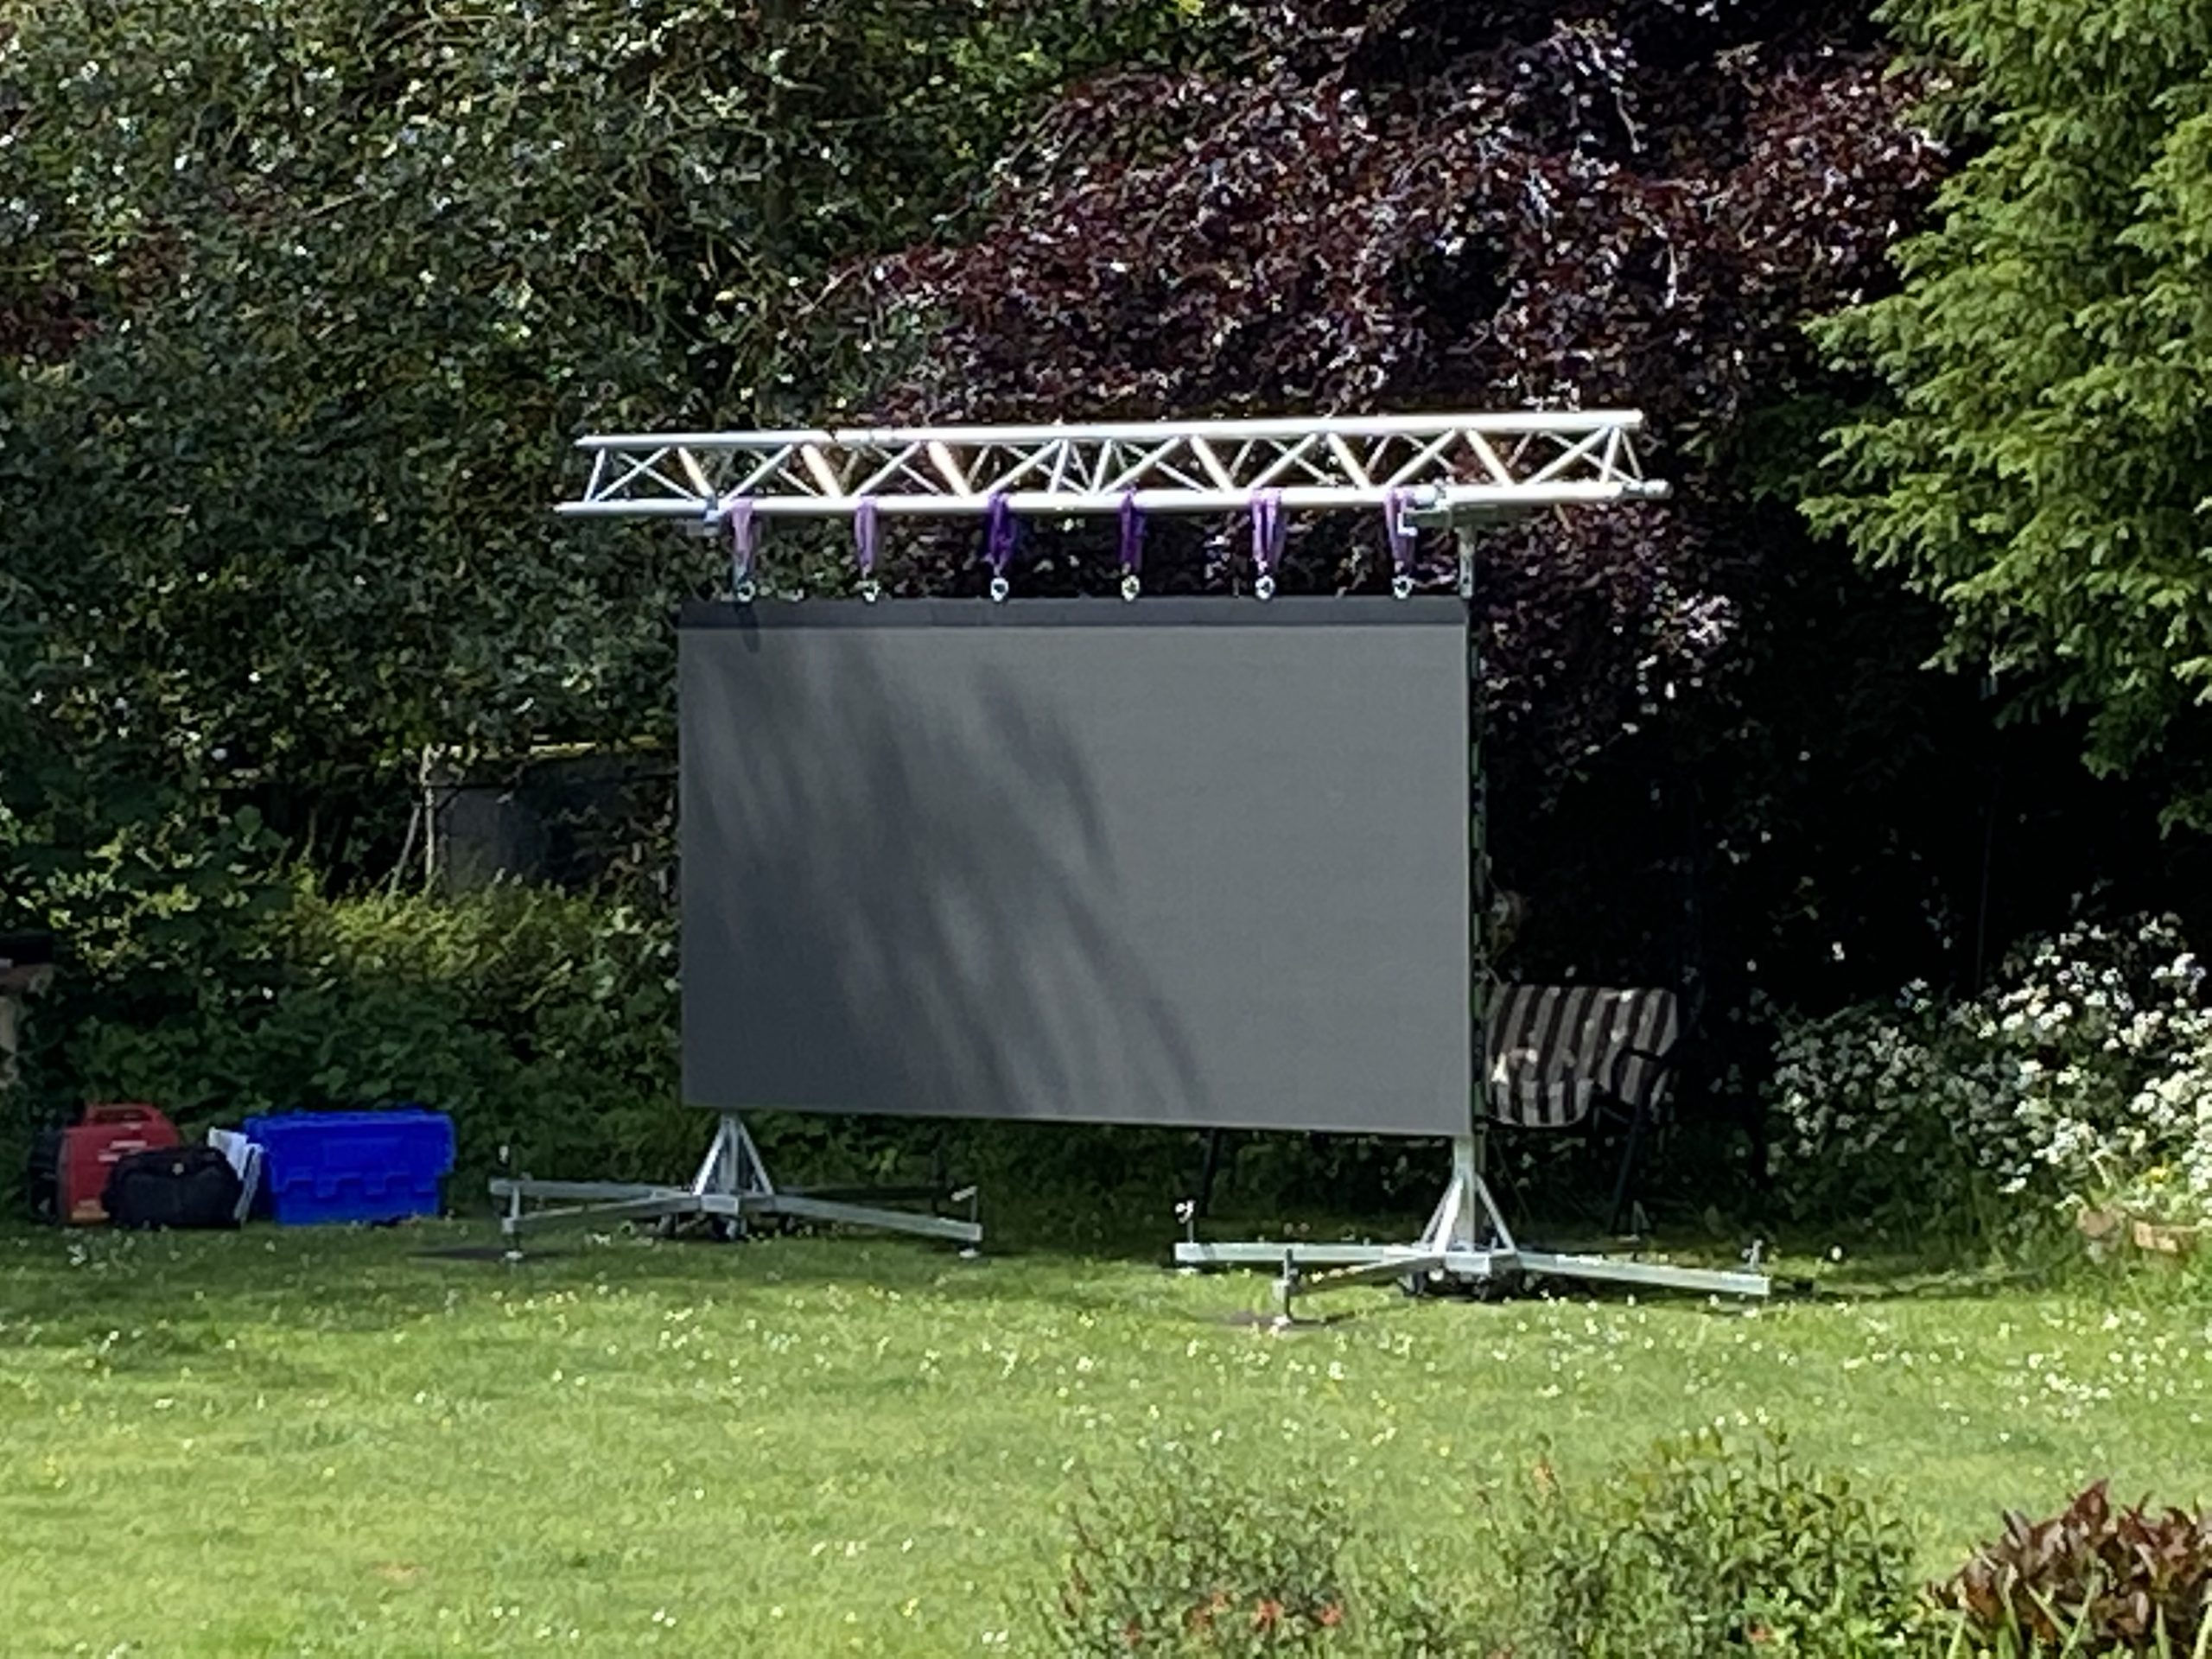 Outdoor LED cinema screen